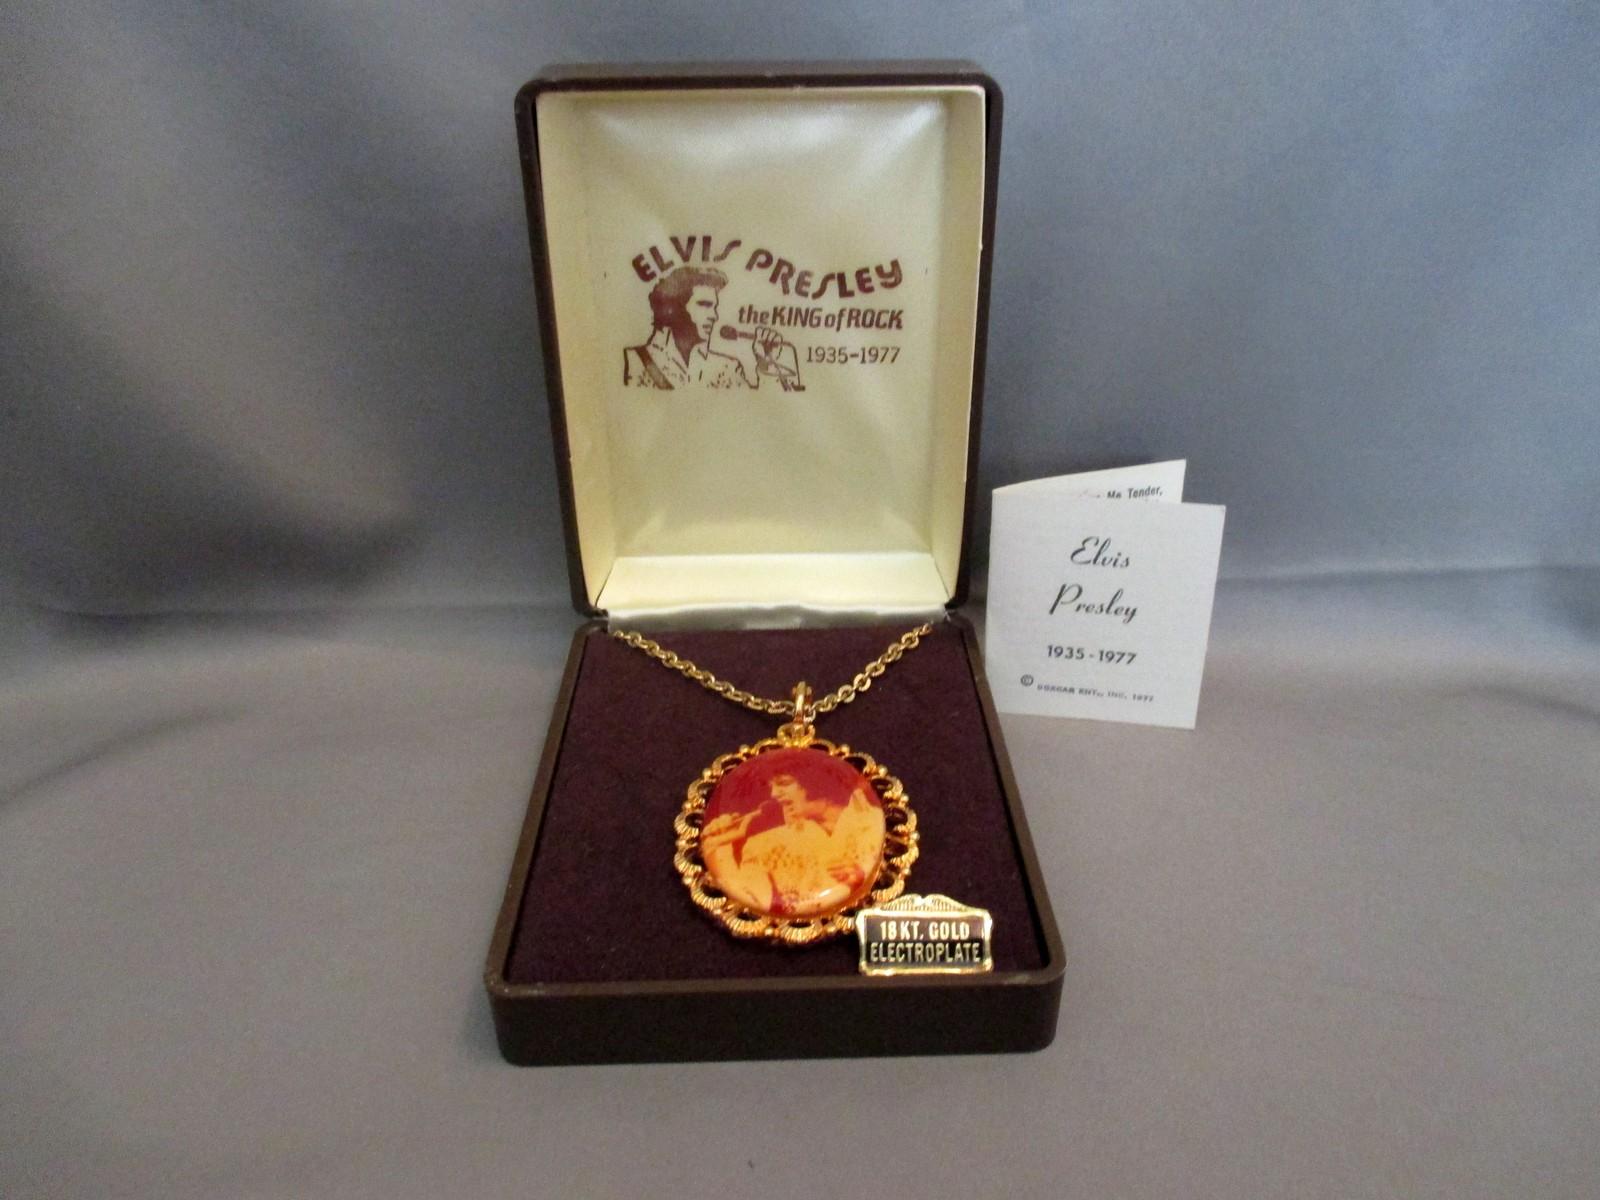 18 K Gold Electroplate Elvis Presley Necklace (1977) Boxcar Ent. NIB